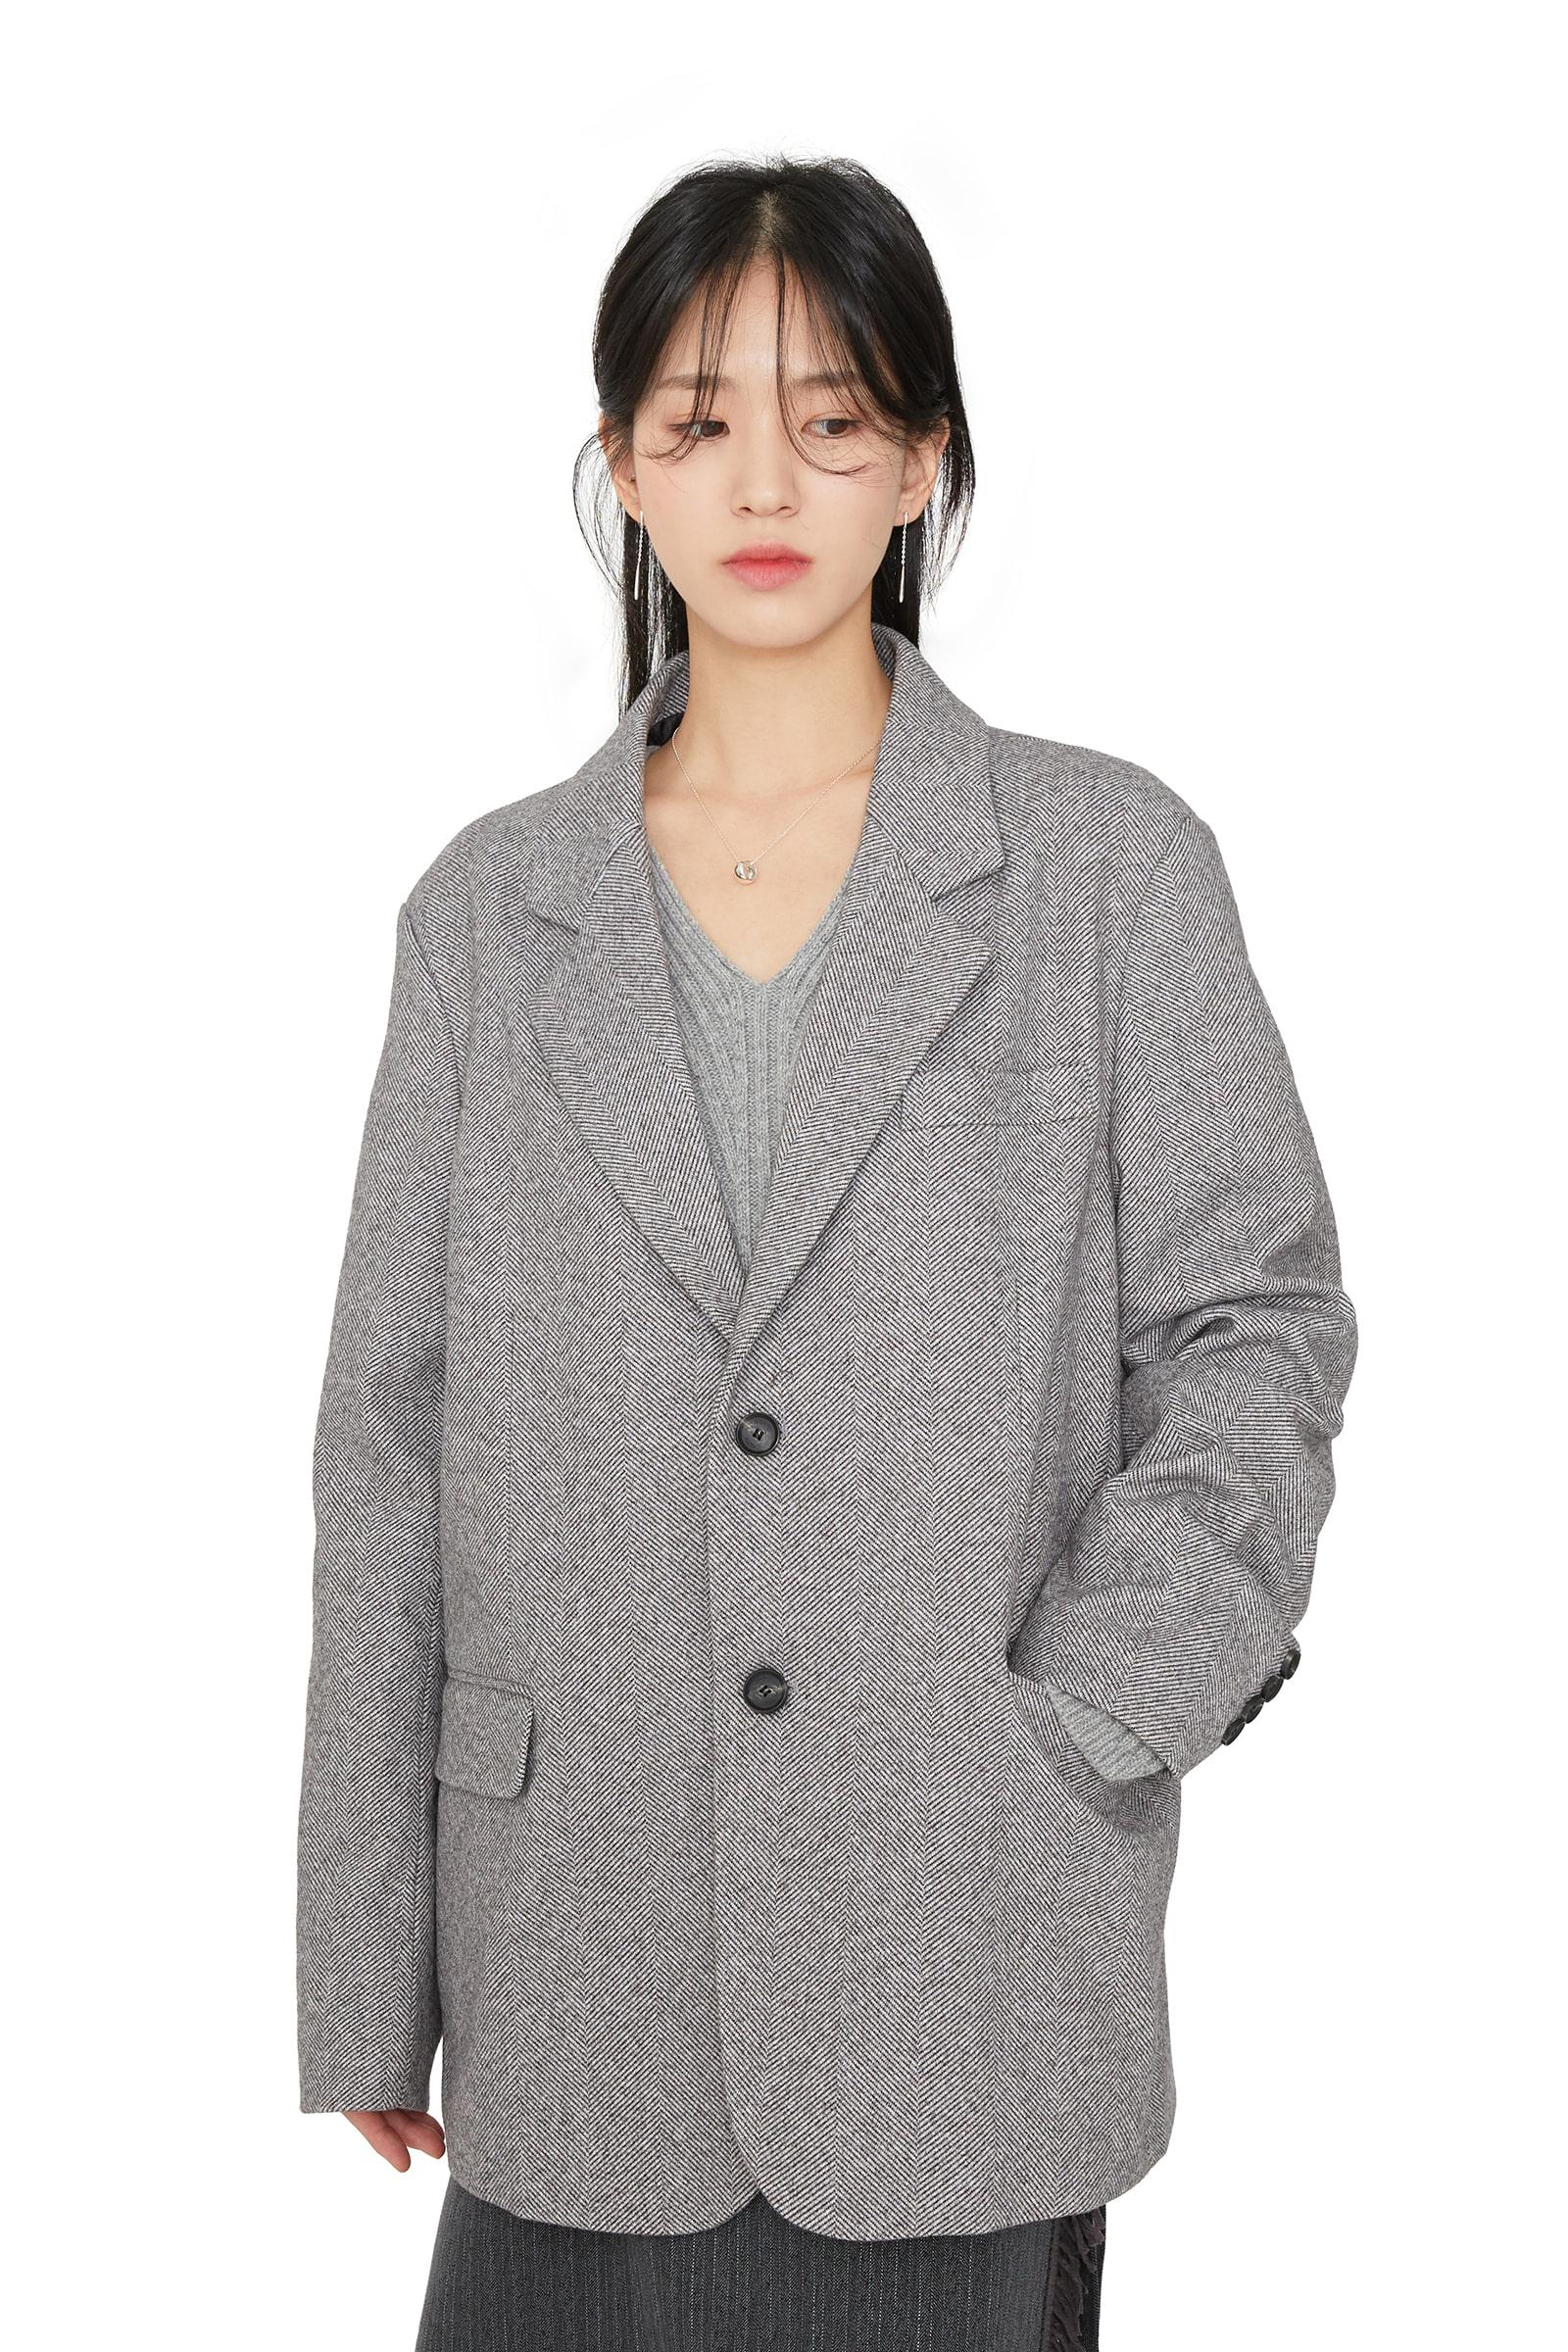 Mentor herringbone unisex wool blazer